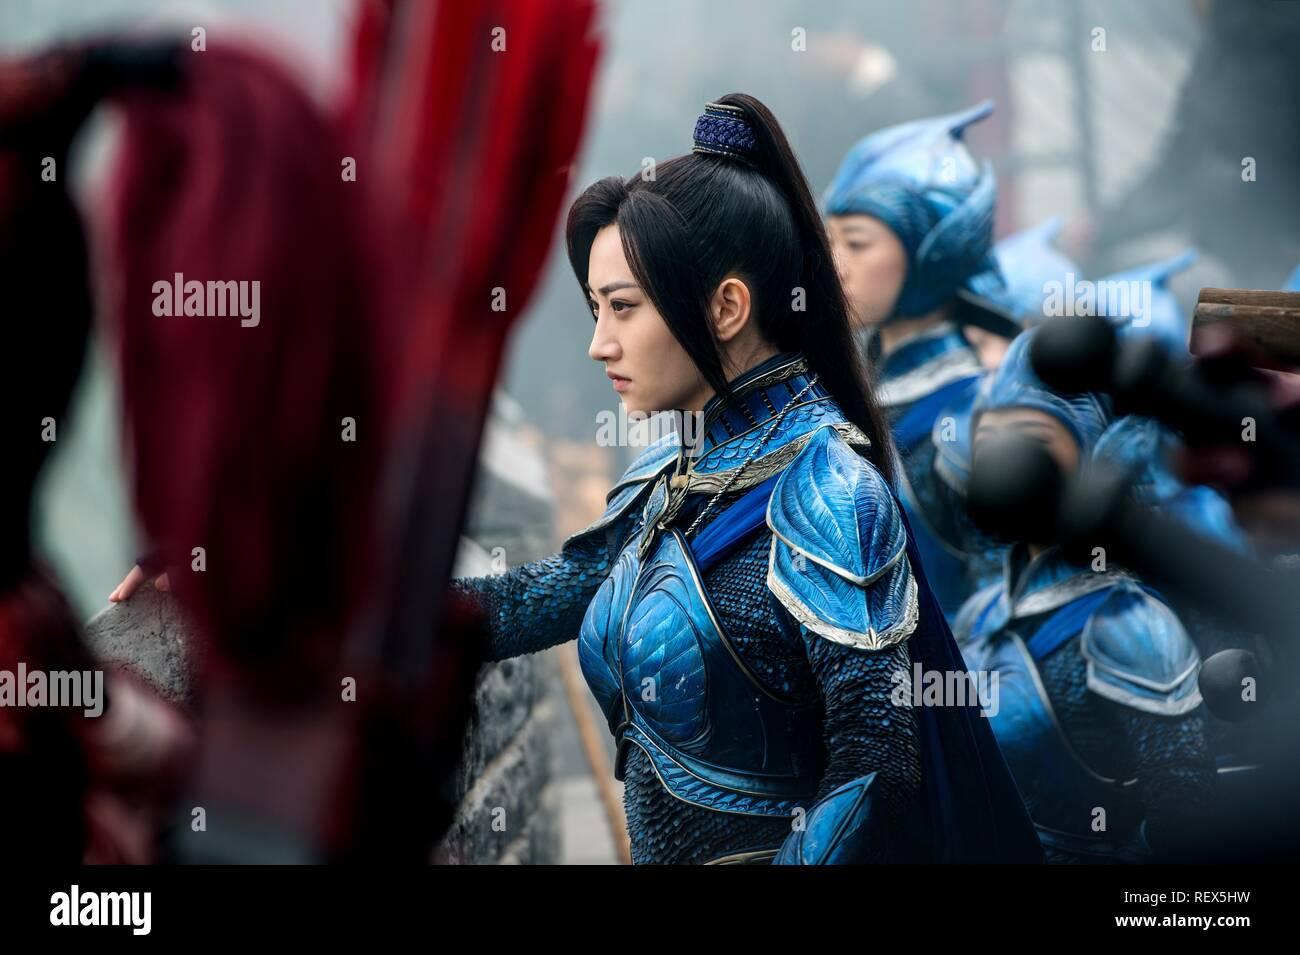 Tian Jing The Great Wall 2016 Stock Photo Alamy